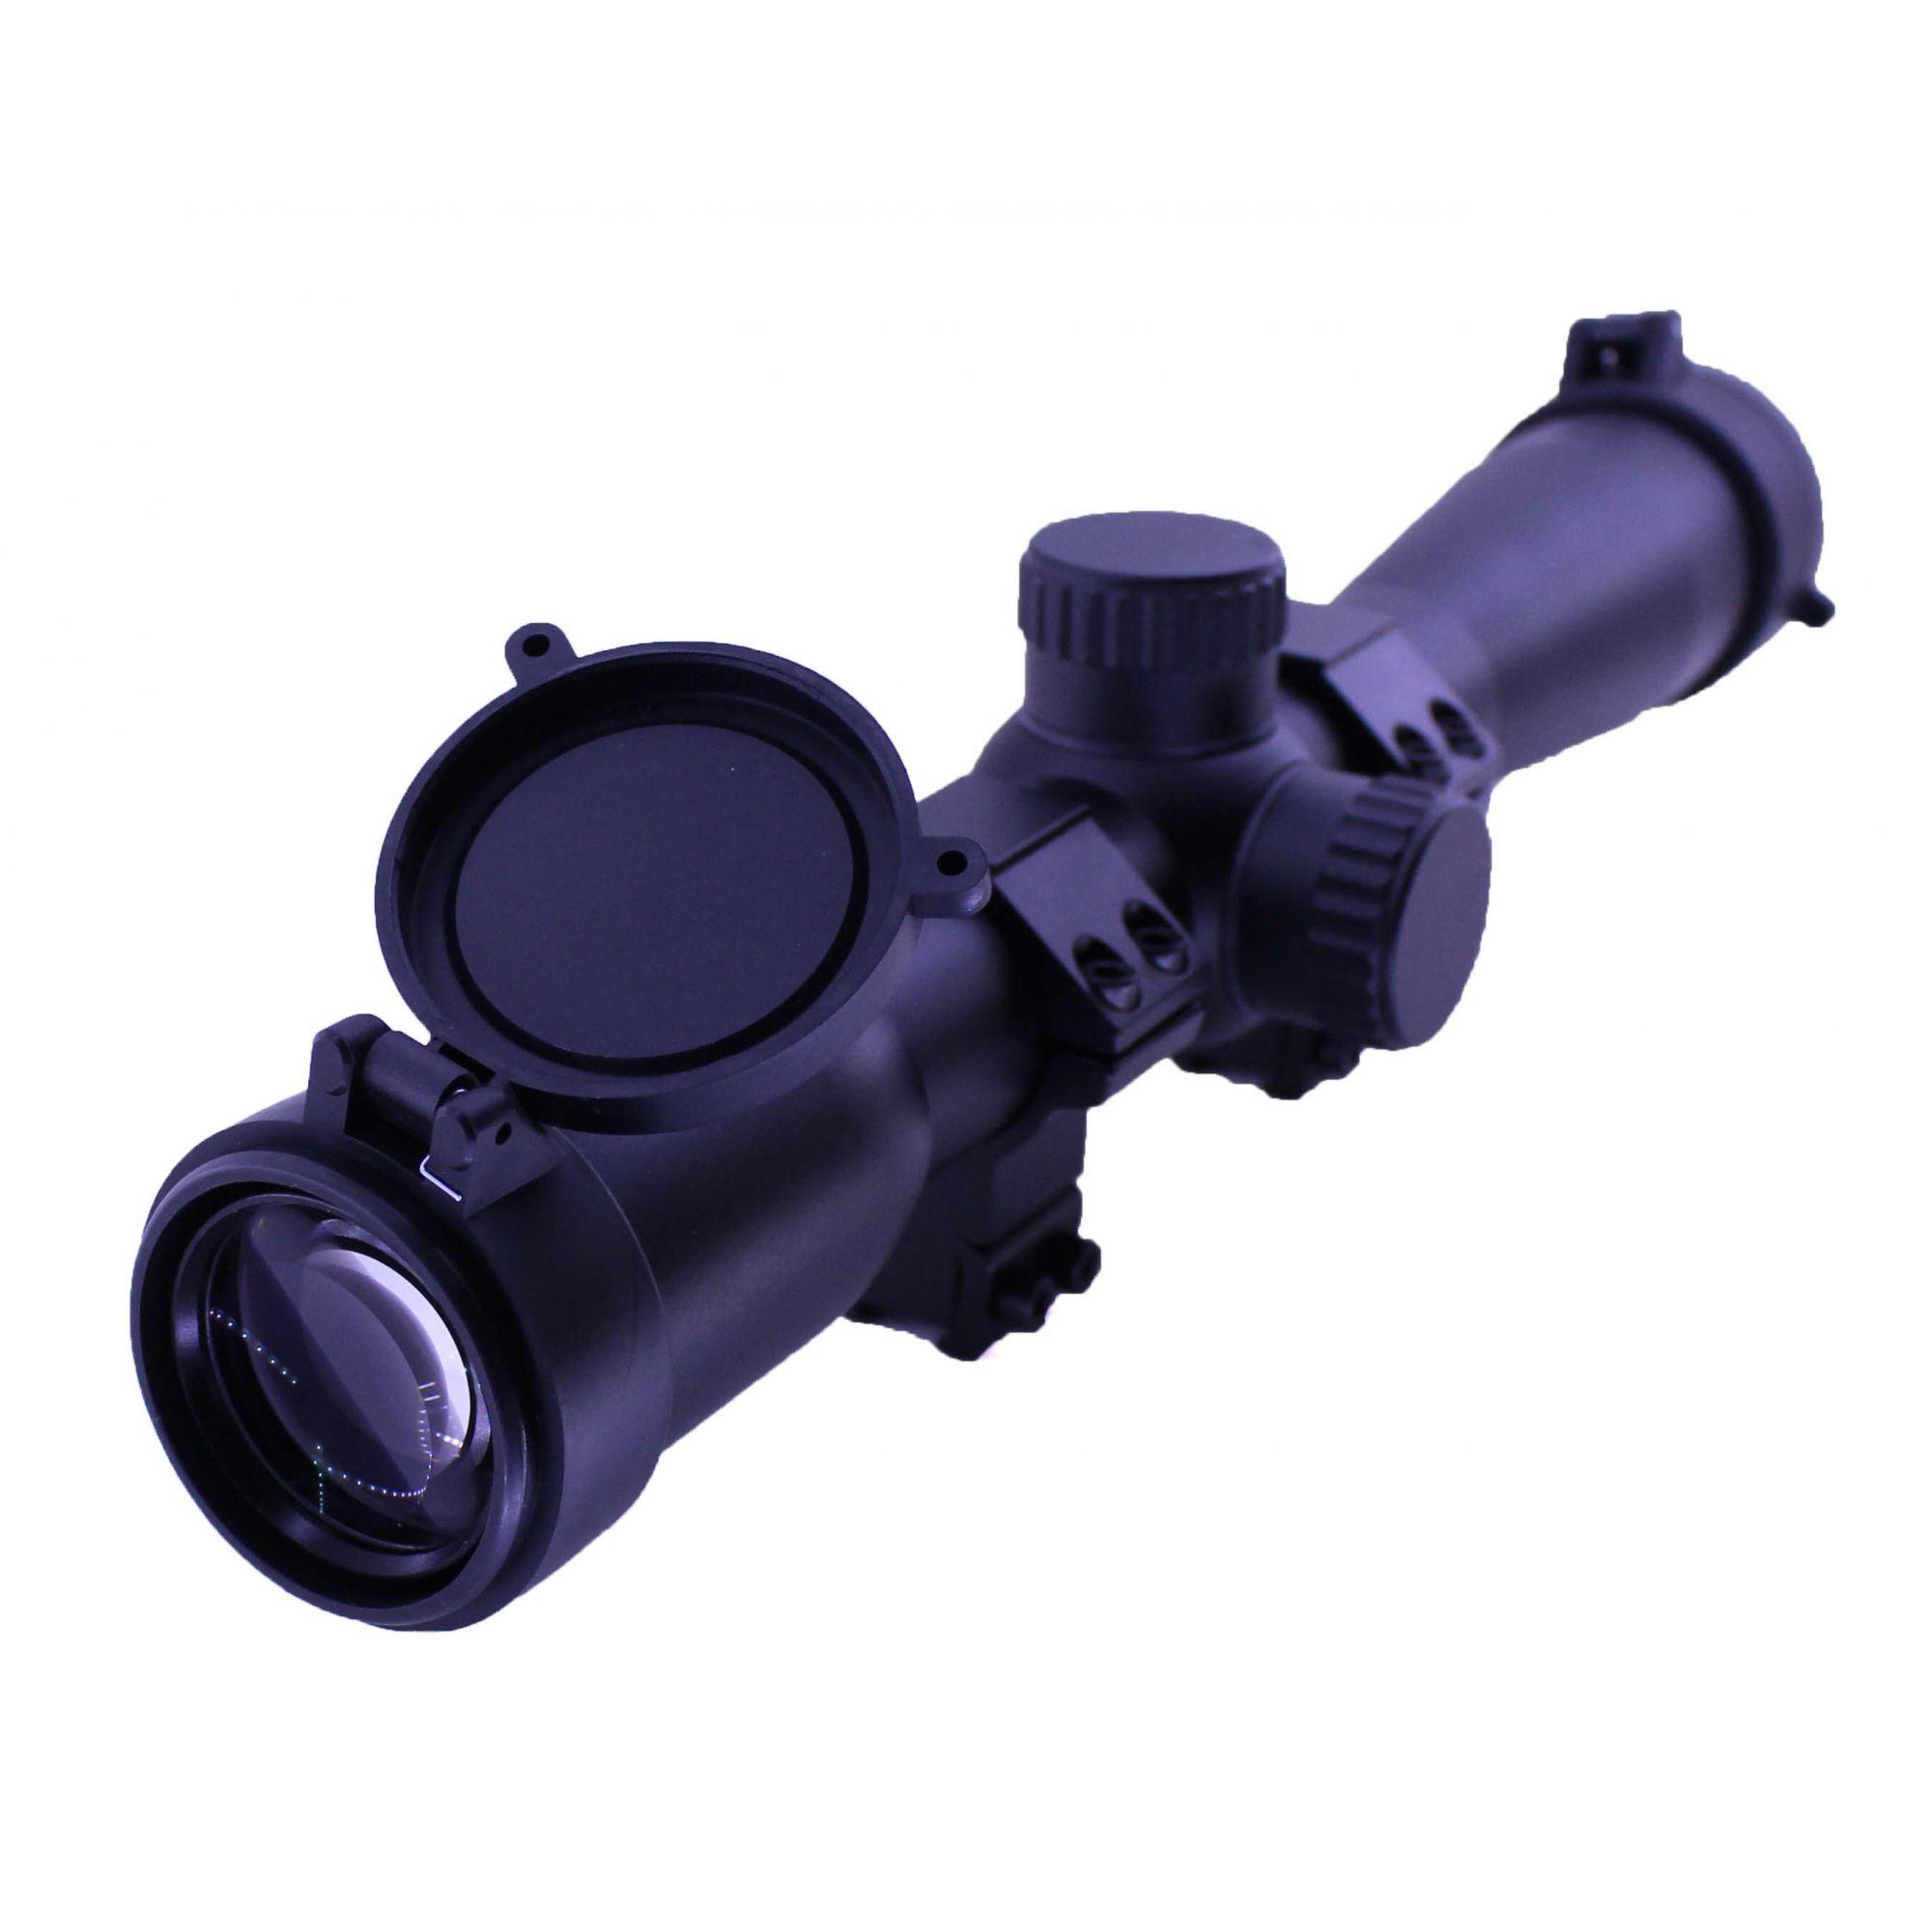 Luneta Rossi 5.9 X 35.9 - Mount 3/8 11mm